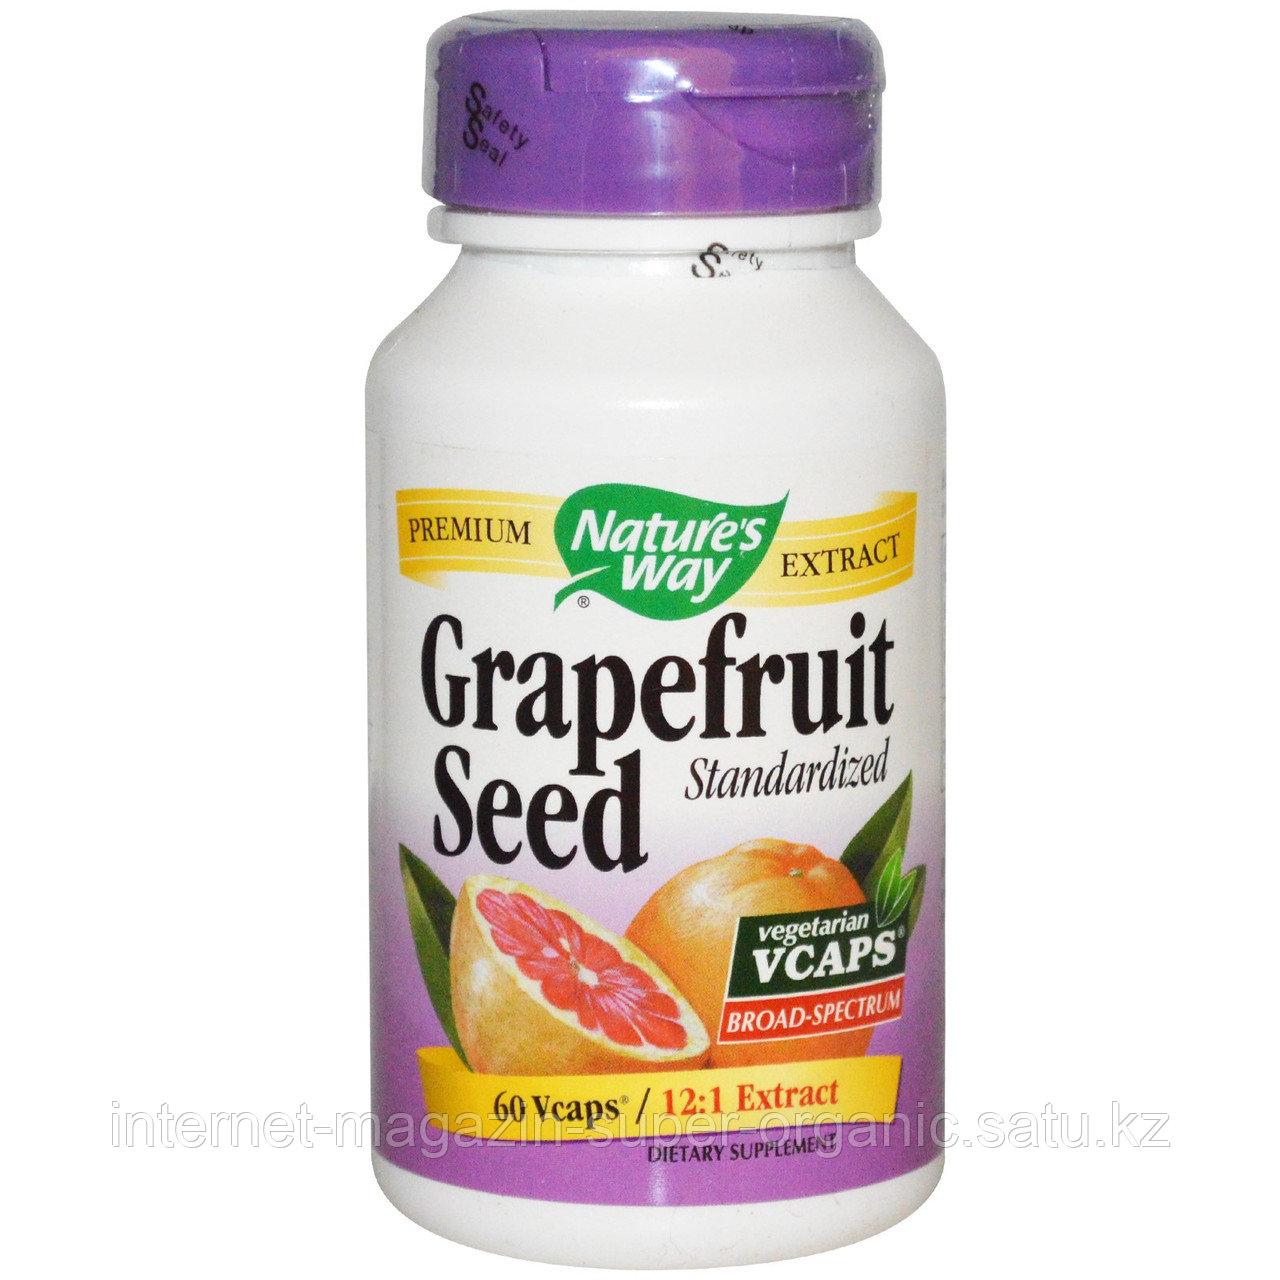 Косточки грейпфрута экстракт, (Grapefruit Seed, Standardized), 60 капсул, Nature's Way